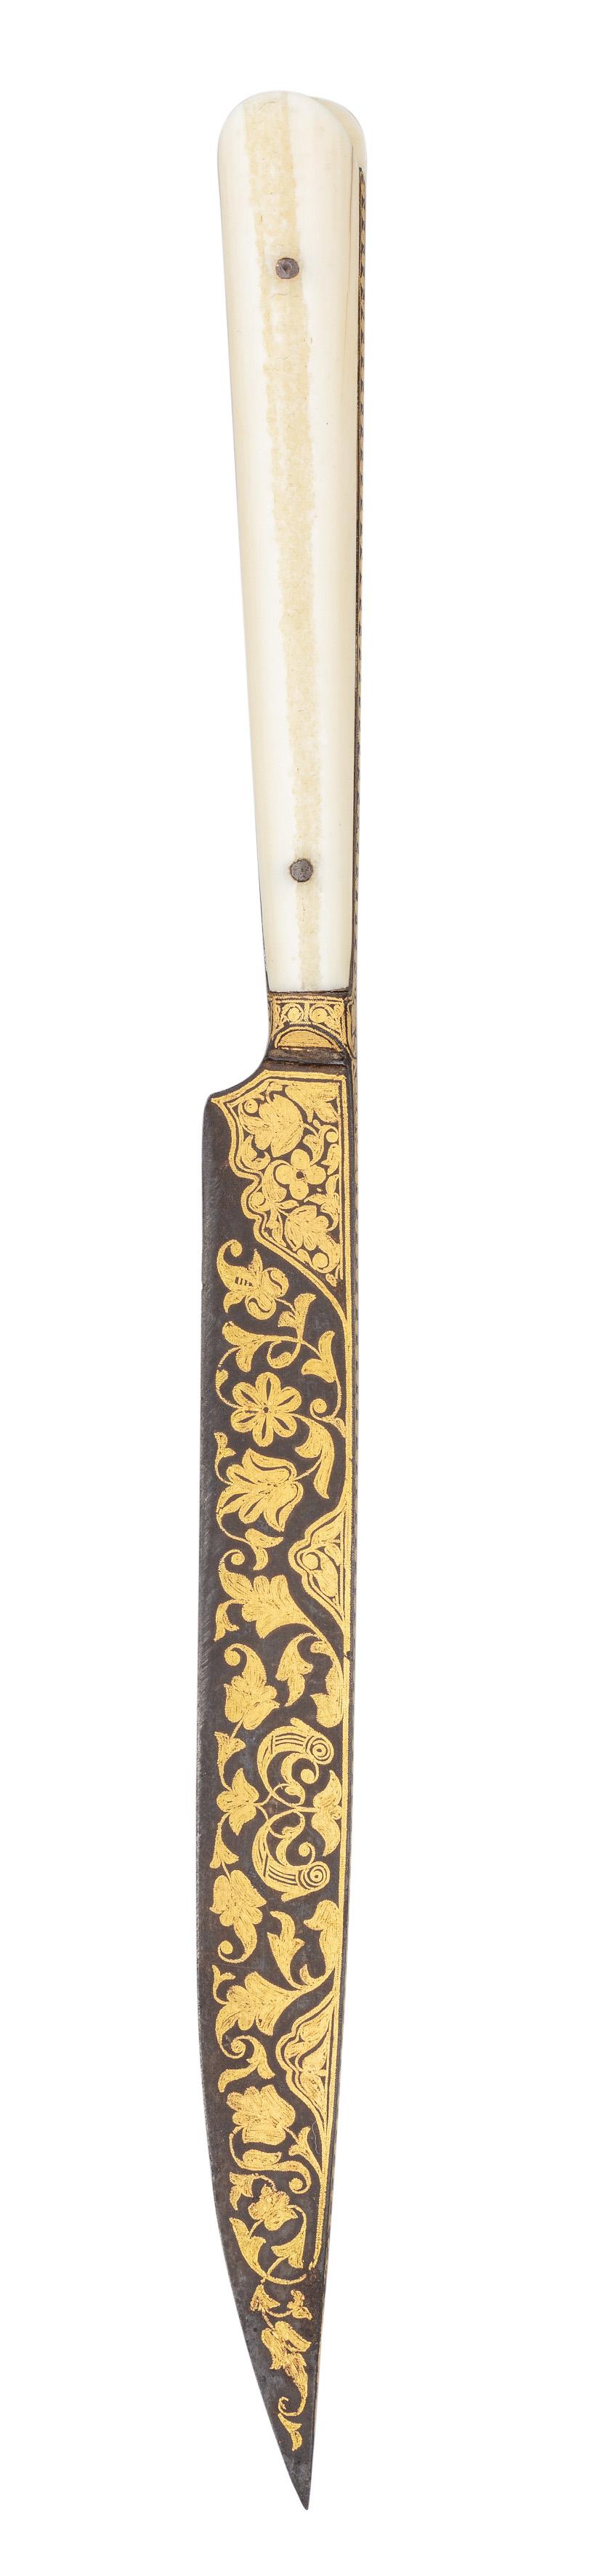 ˜Ⓦ A DAGGER (BICHAQ)^ BALKAN^ SECOND HALF OF THE 18TH CENTURY